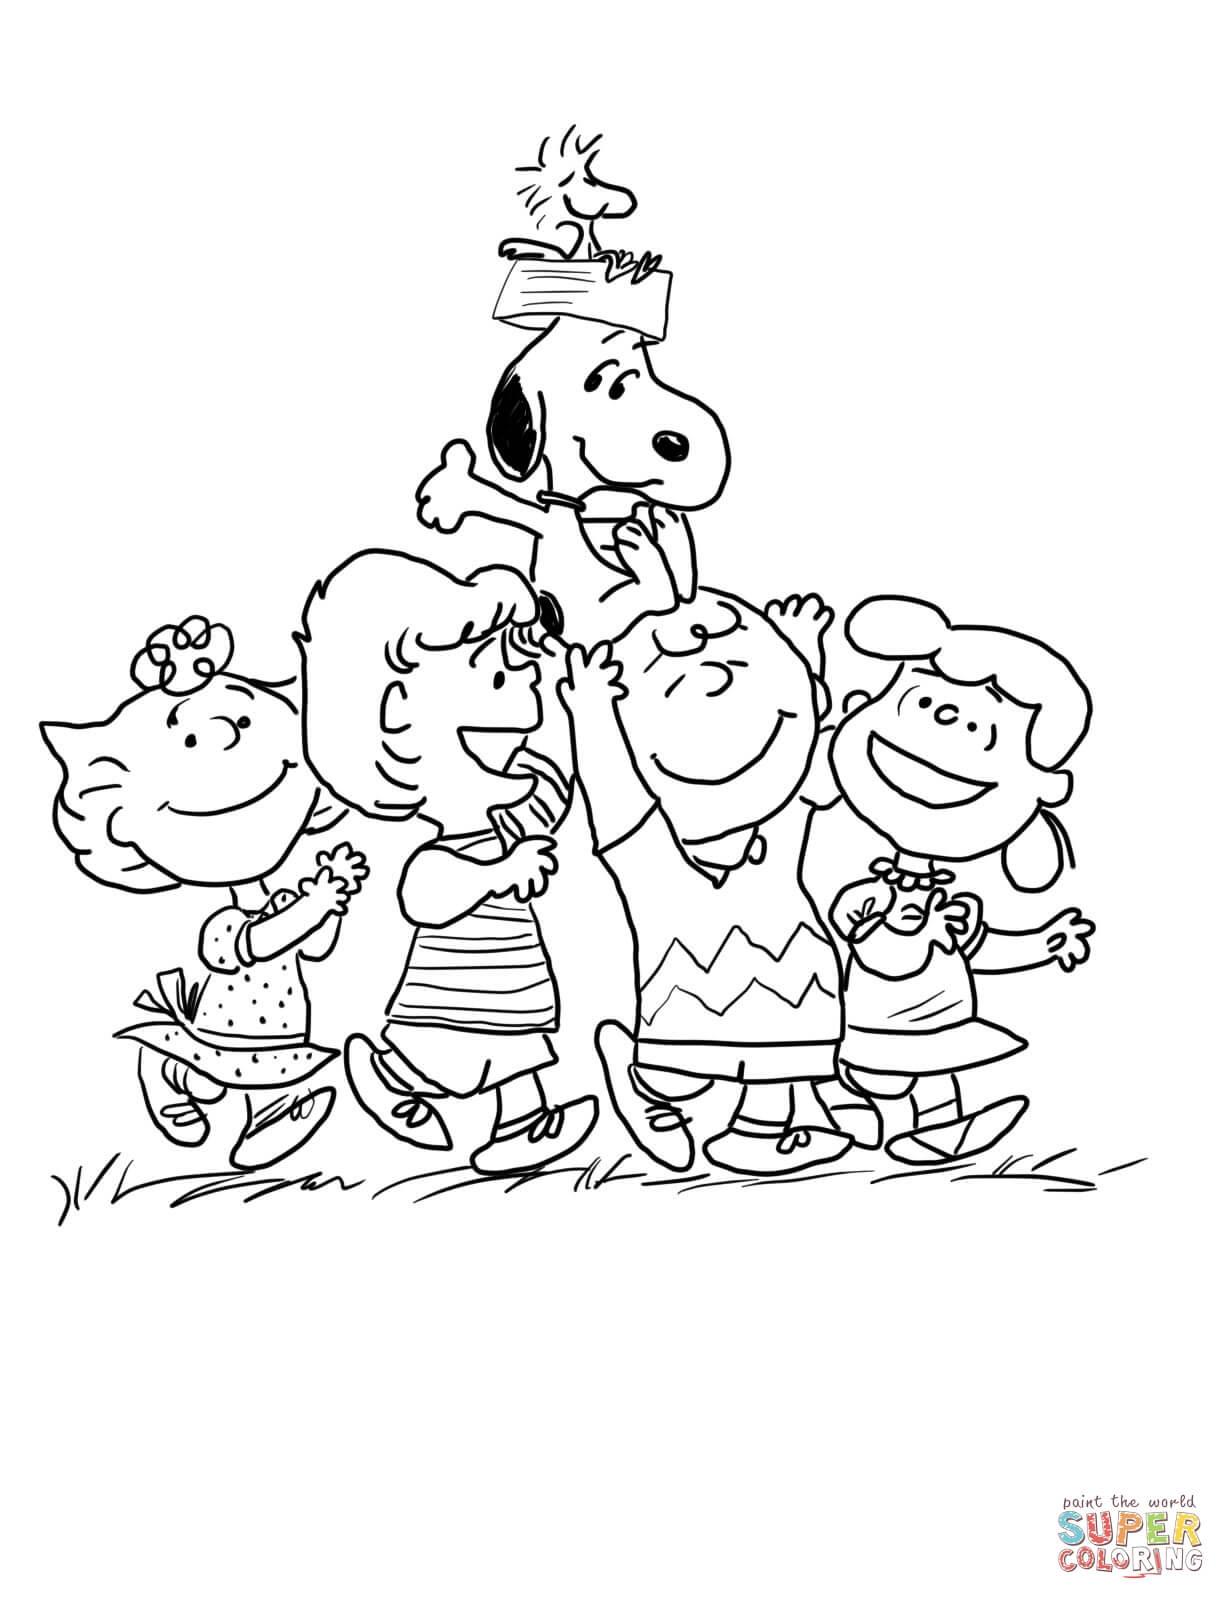 1226x1600 Peanuts Coloring Pages Luxury Linus Free Printable Peanuts